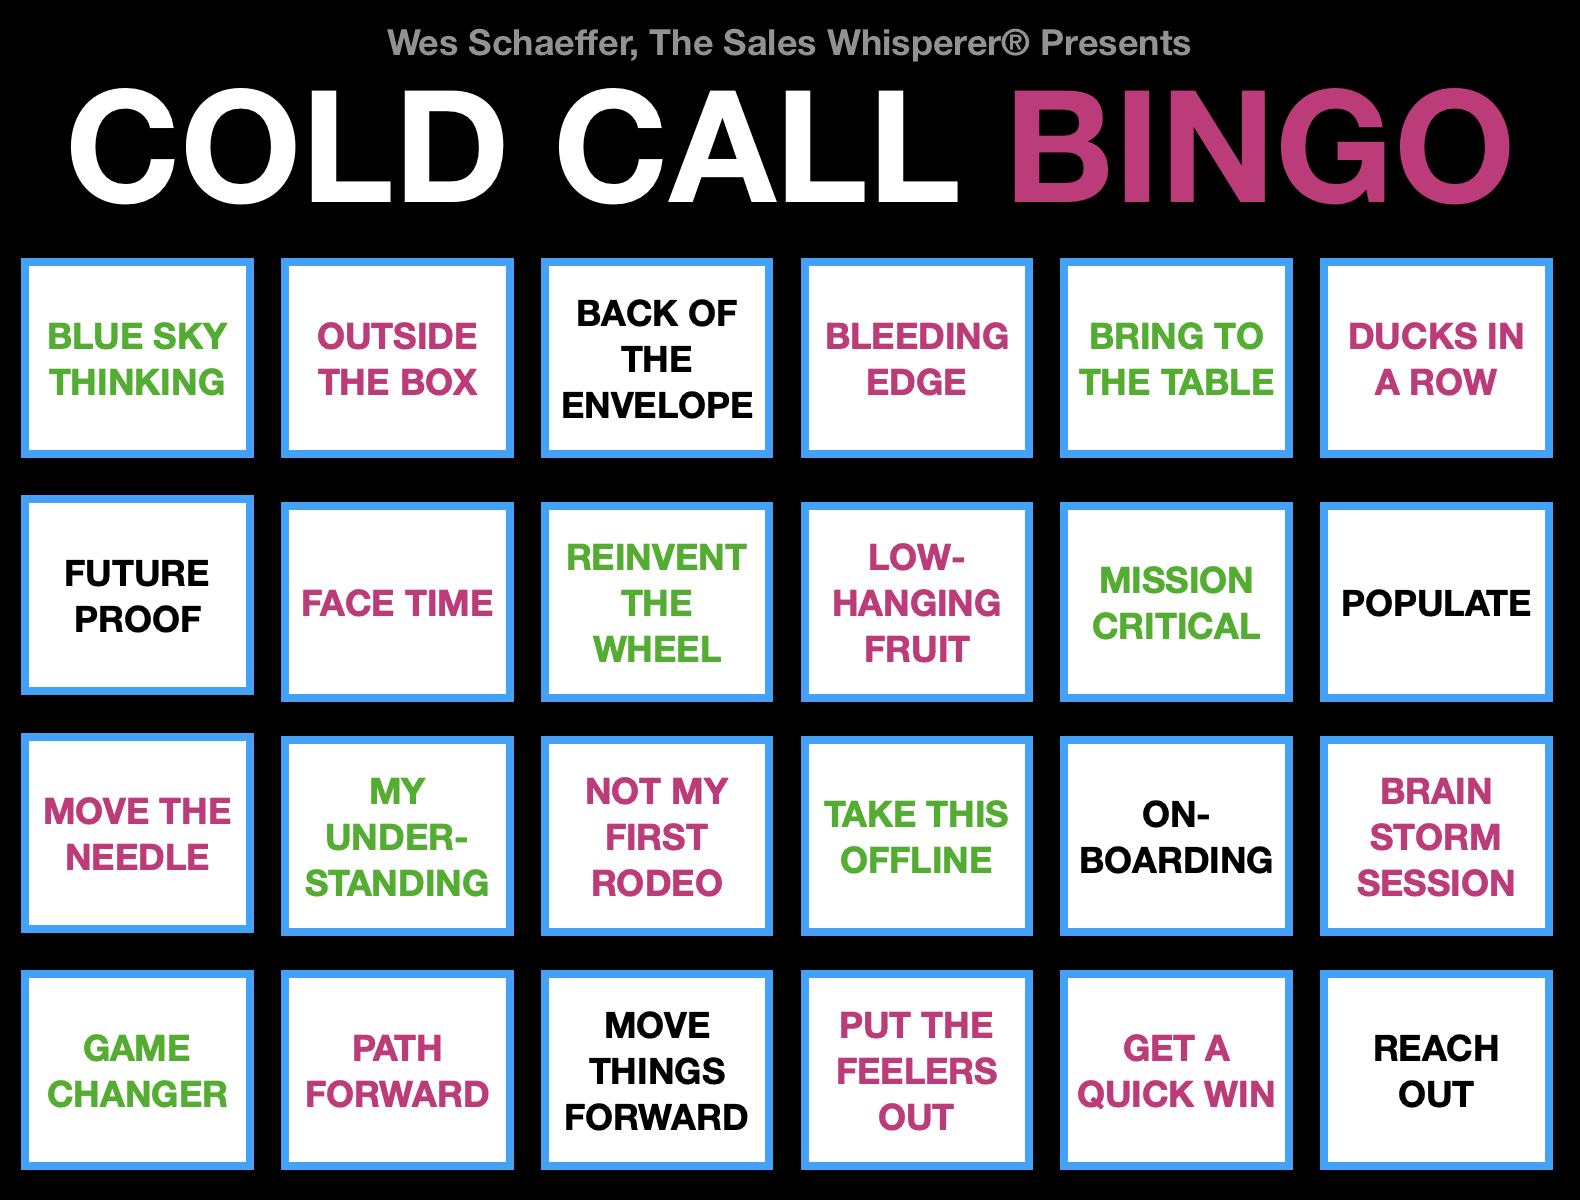 Cold Call Bingo Wes Schaeffer